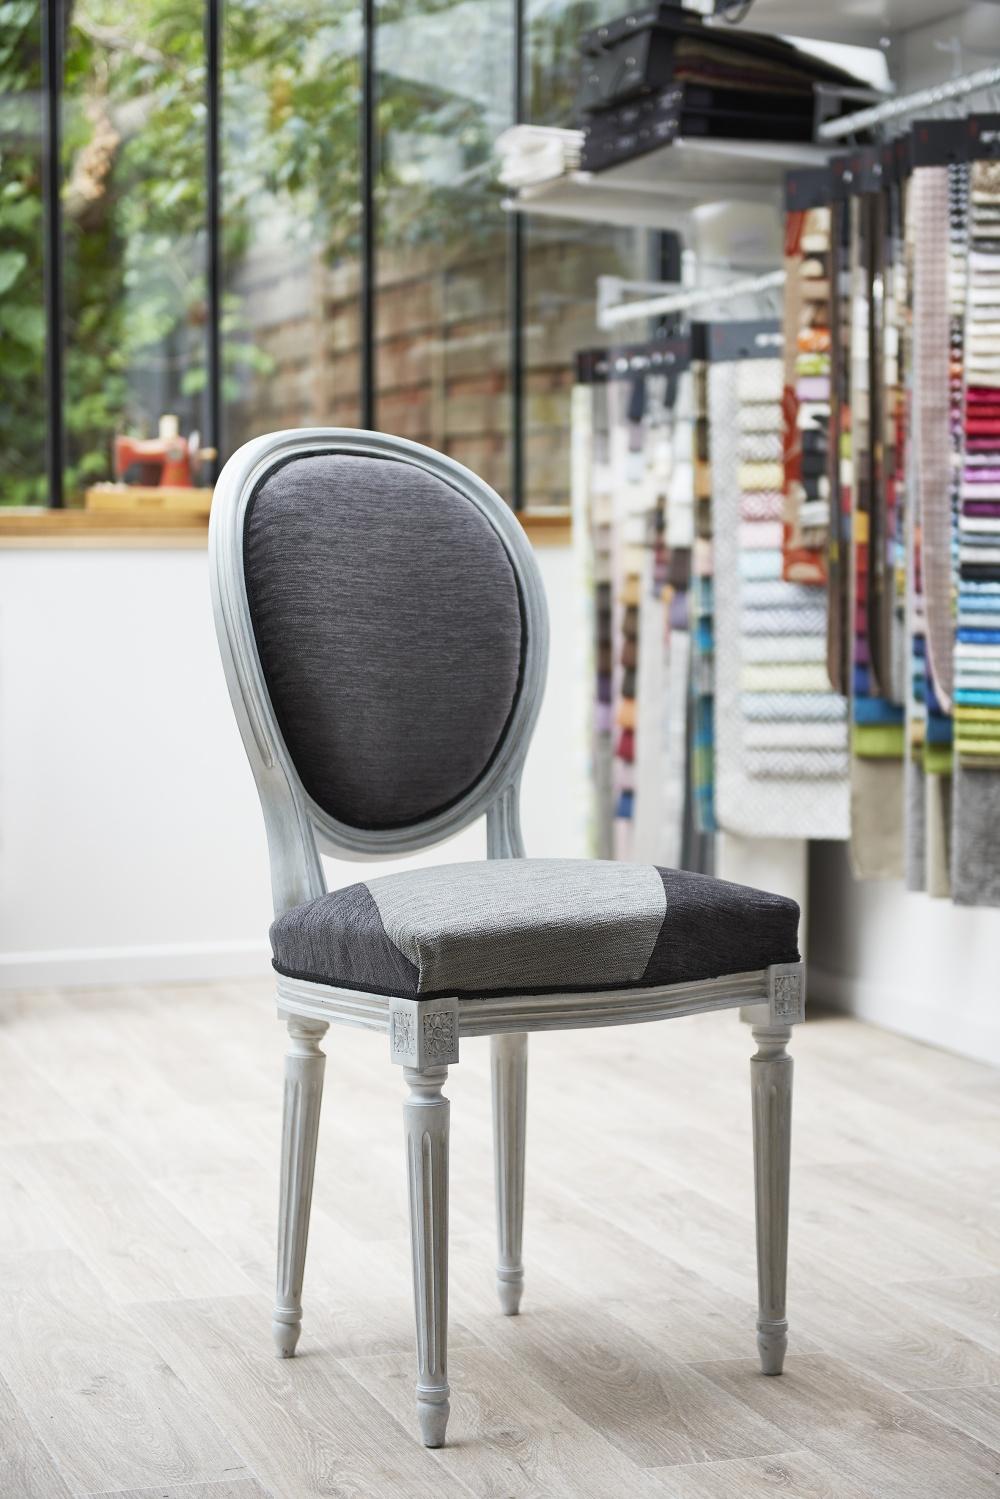 Chaise m daillon louis xvi atelier tapissier la kabana nanou - Chaise style louis xvi moderne ...